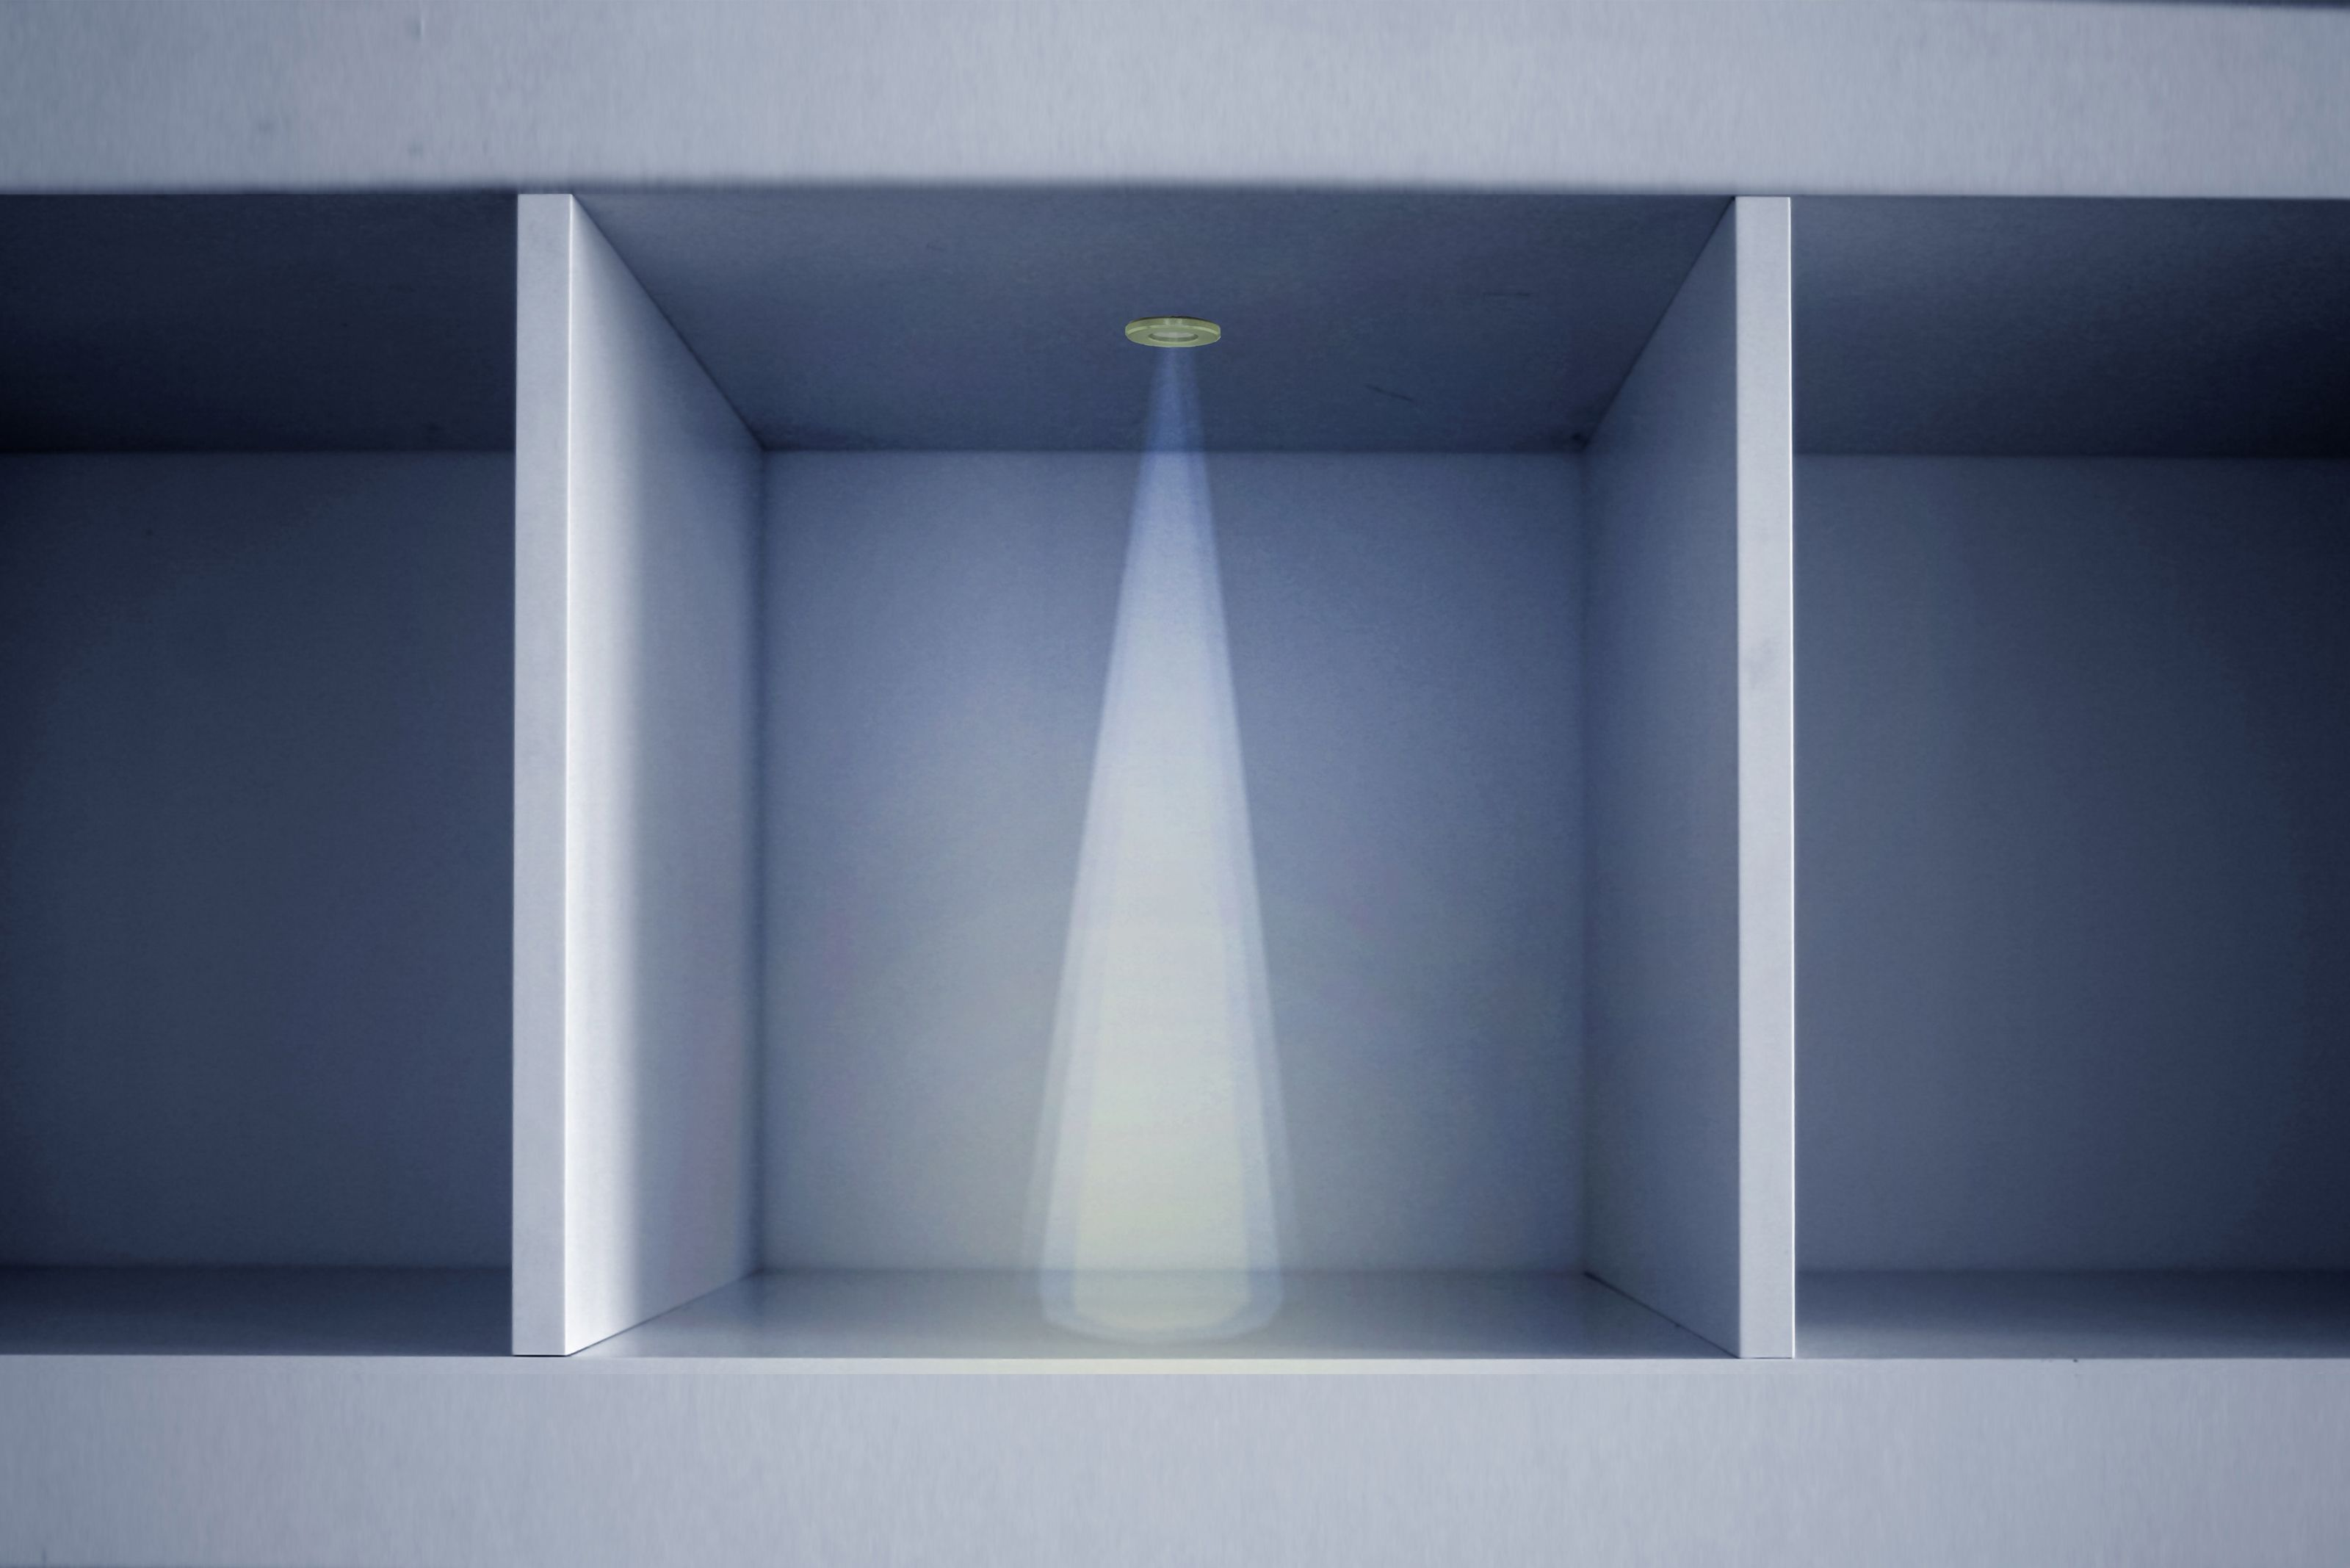 uplight-dinky-3-mj-lighting-v2